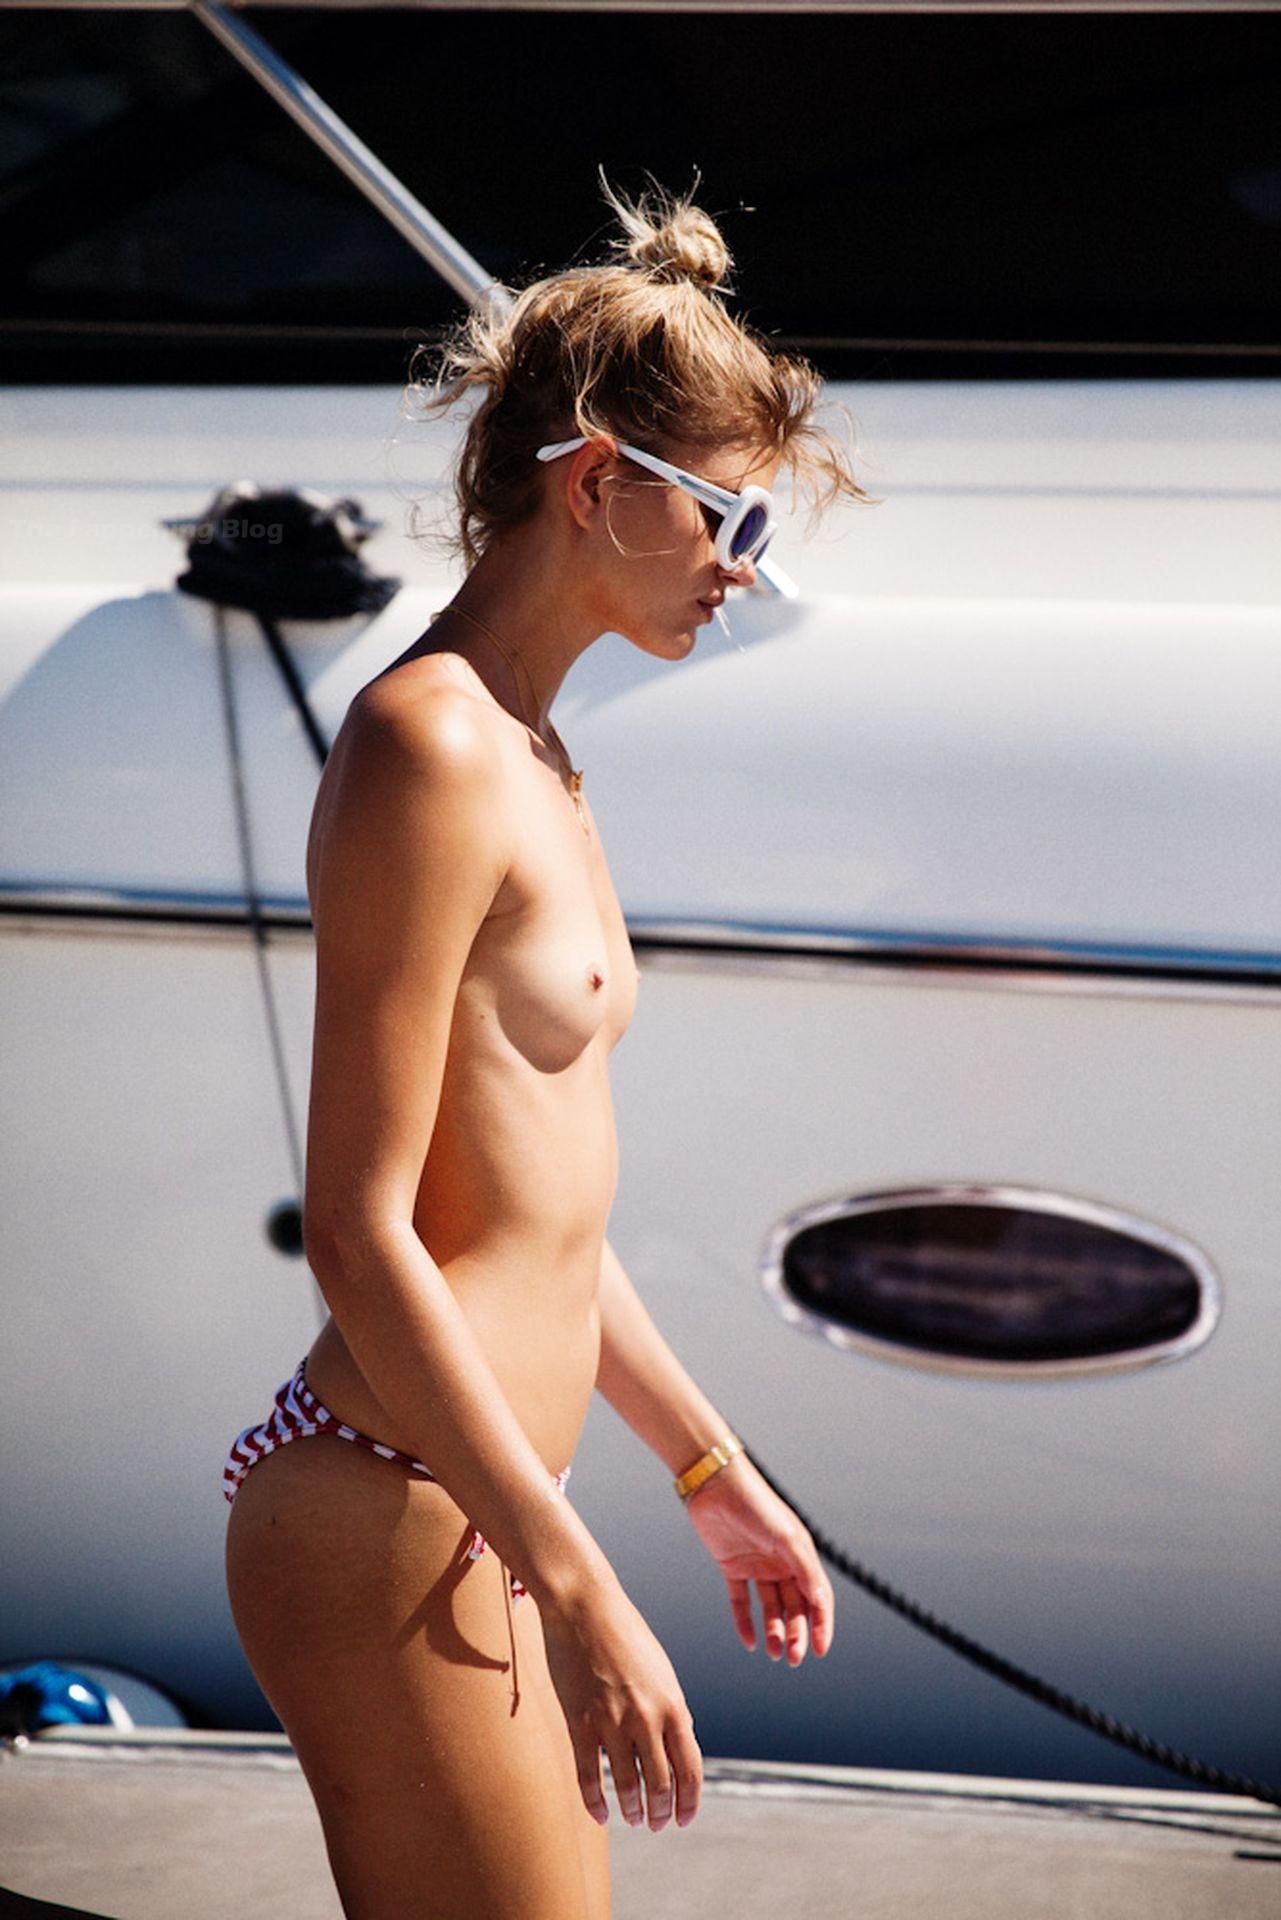 Louise Mikkelsen Nude & Sexy 0005